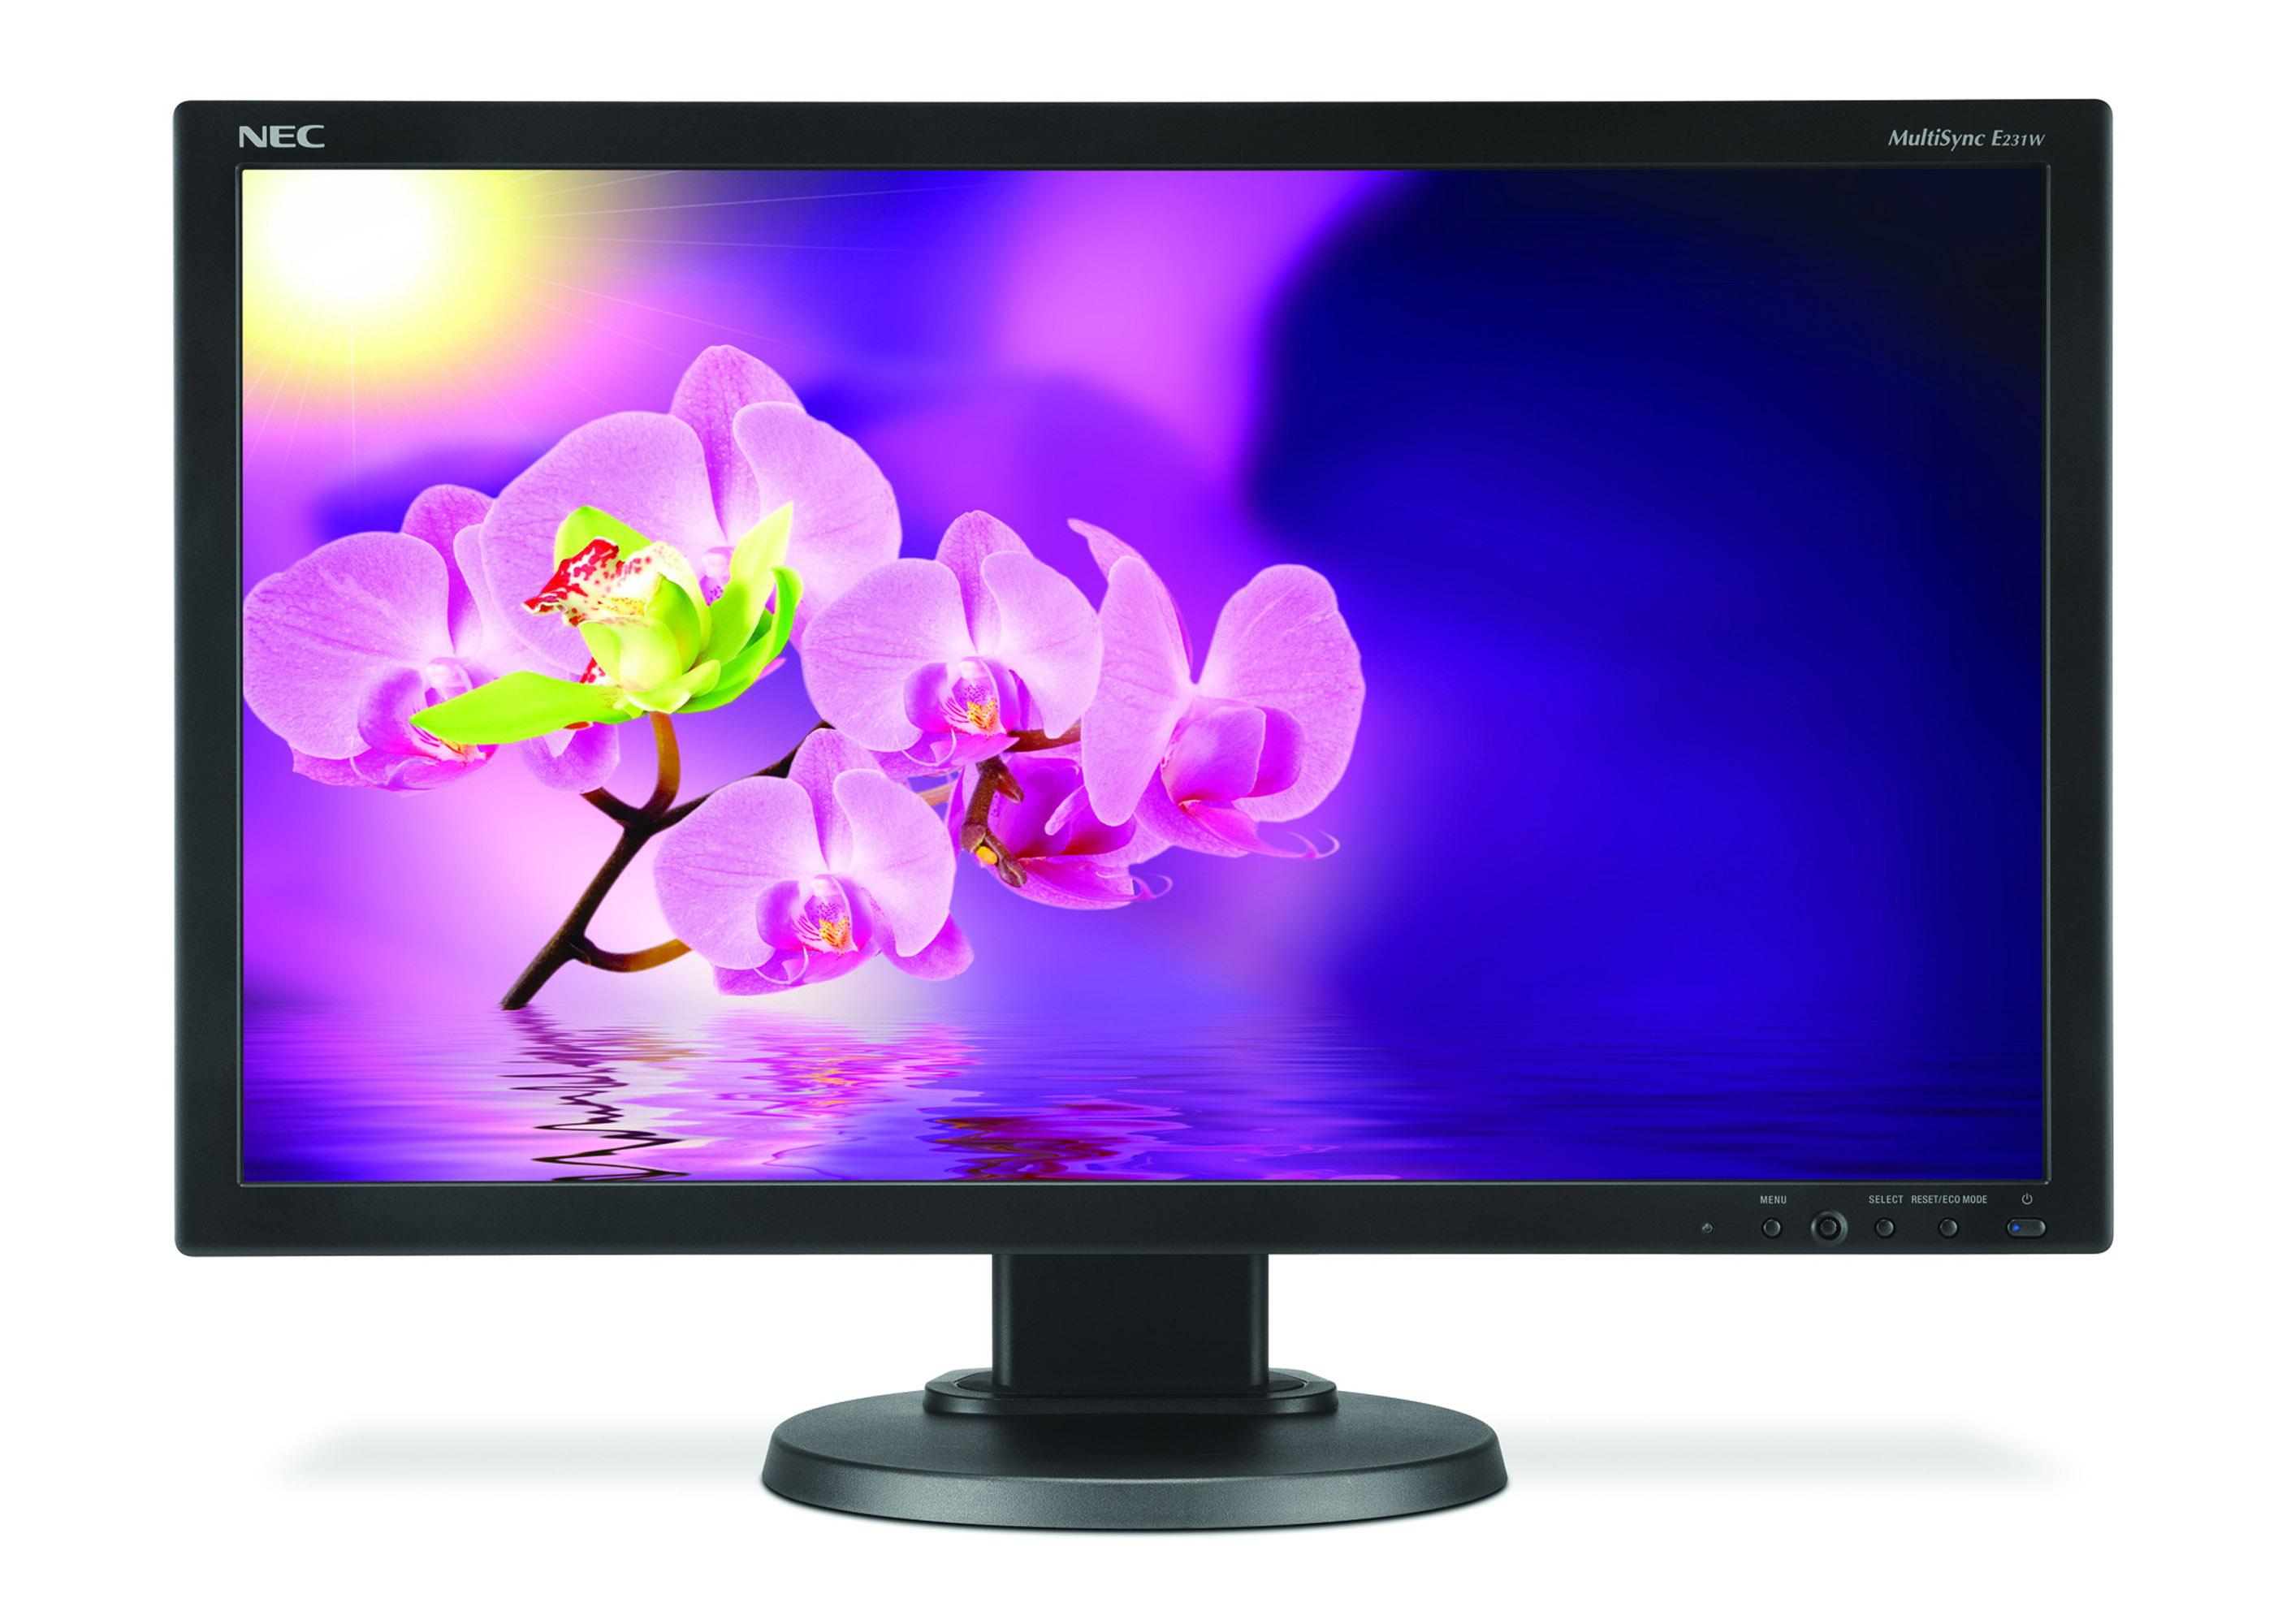 NEC outs MultiSync E231W LED-backlit Monitor